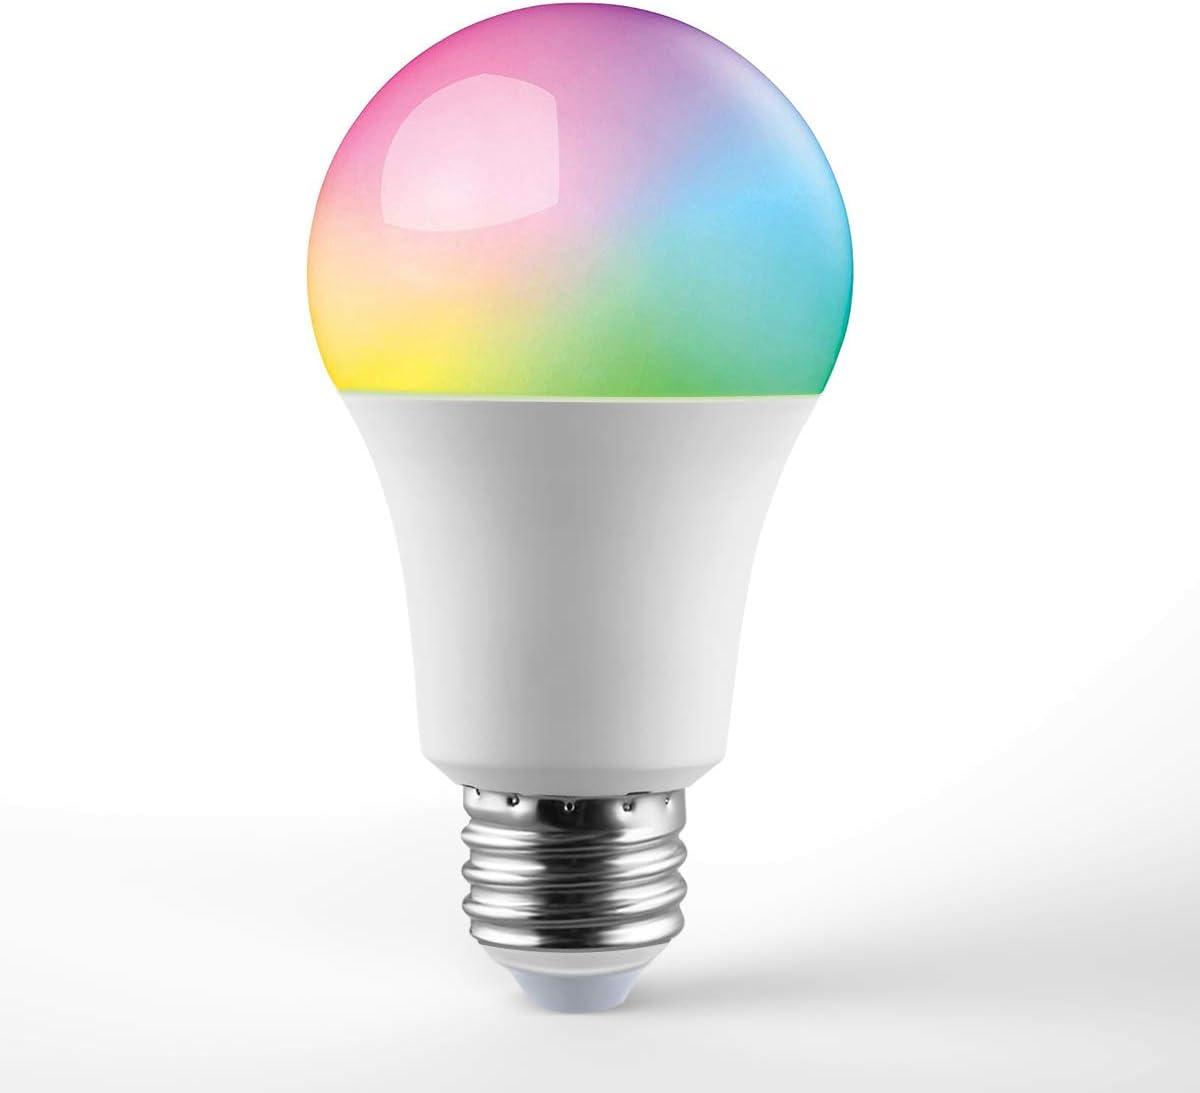 Alexa and Google Assistant KMC Smart LED Light Bulb,Works with Apple HomeKit 2 Pack